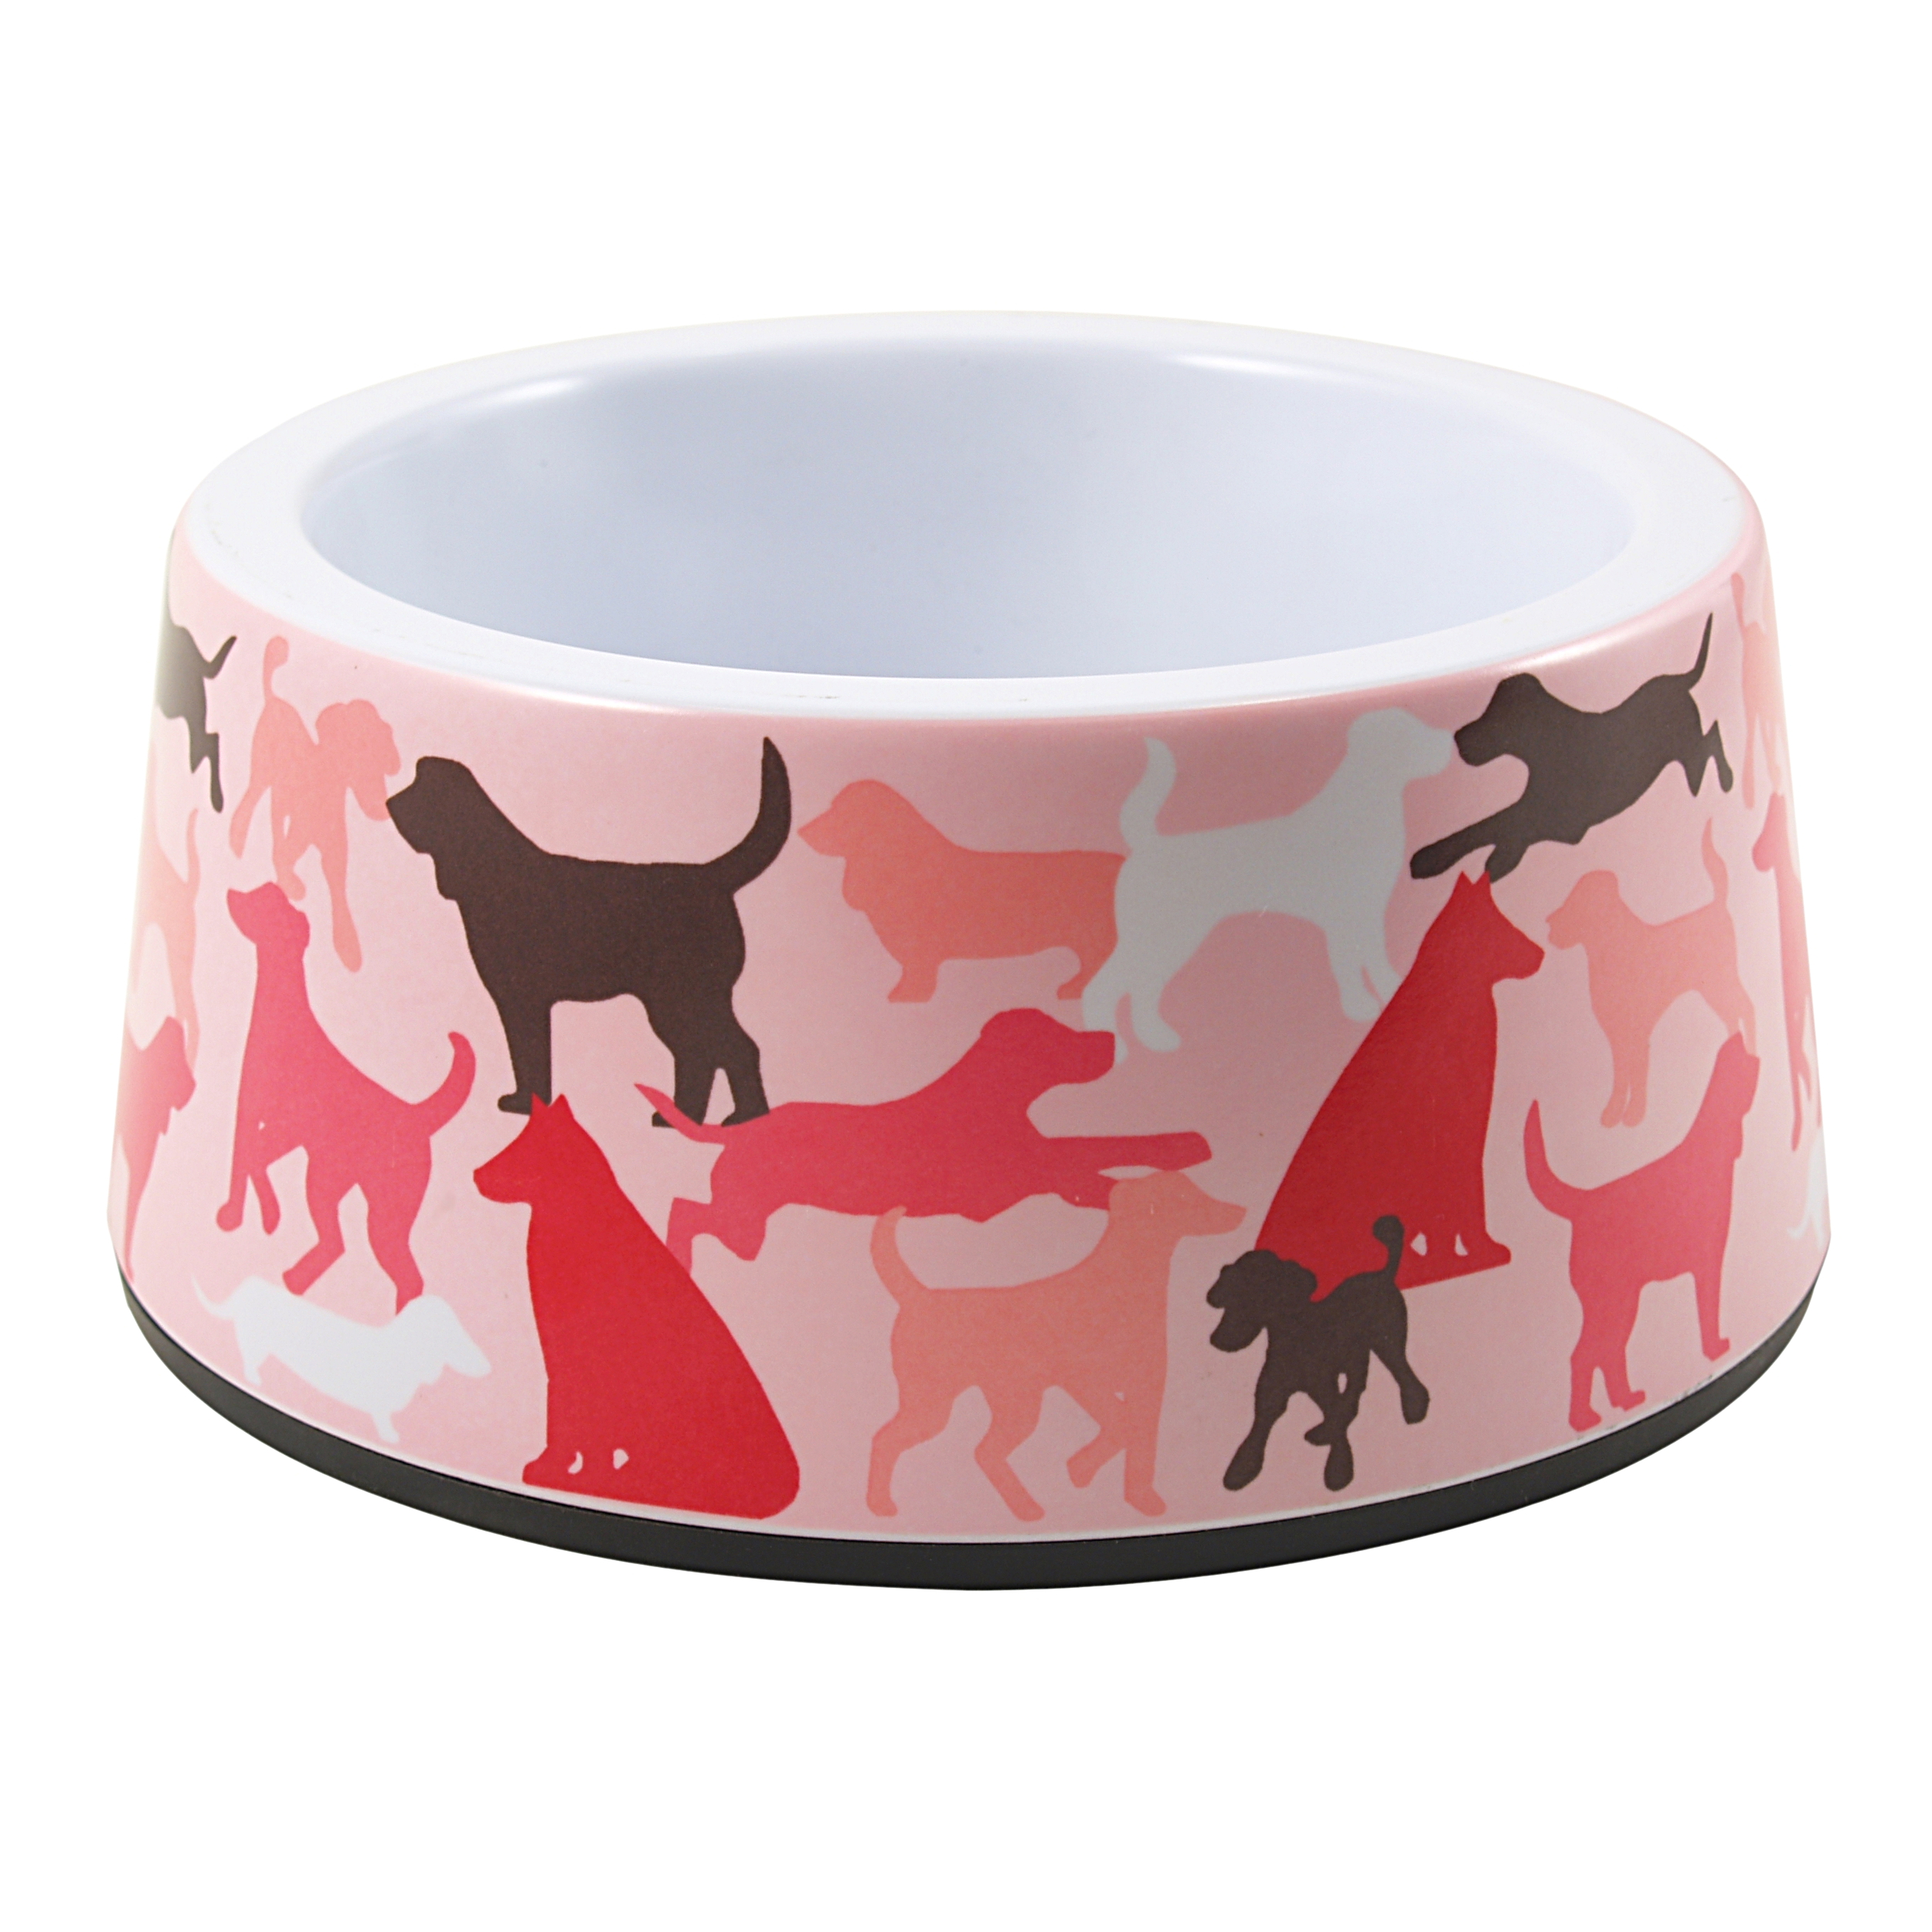 Anchor Hocking Melamine Pretty Pink 3.5 Cup Dog Bowl